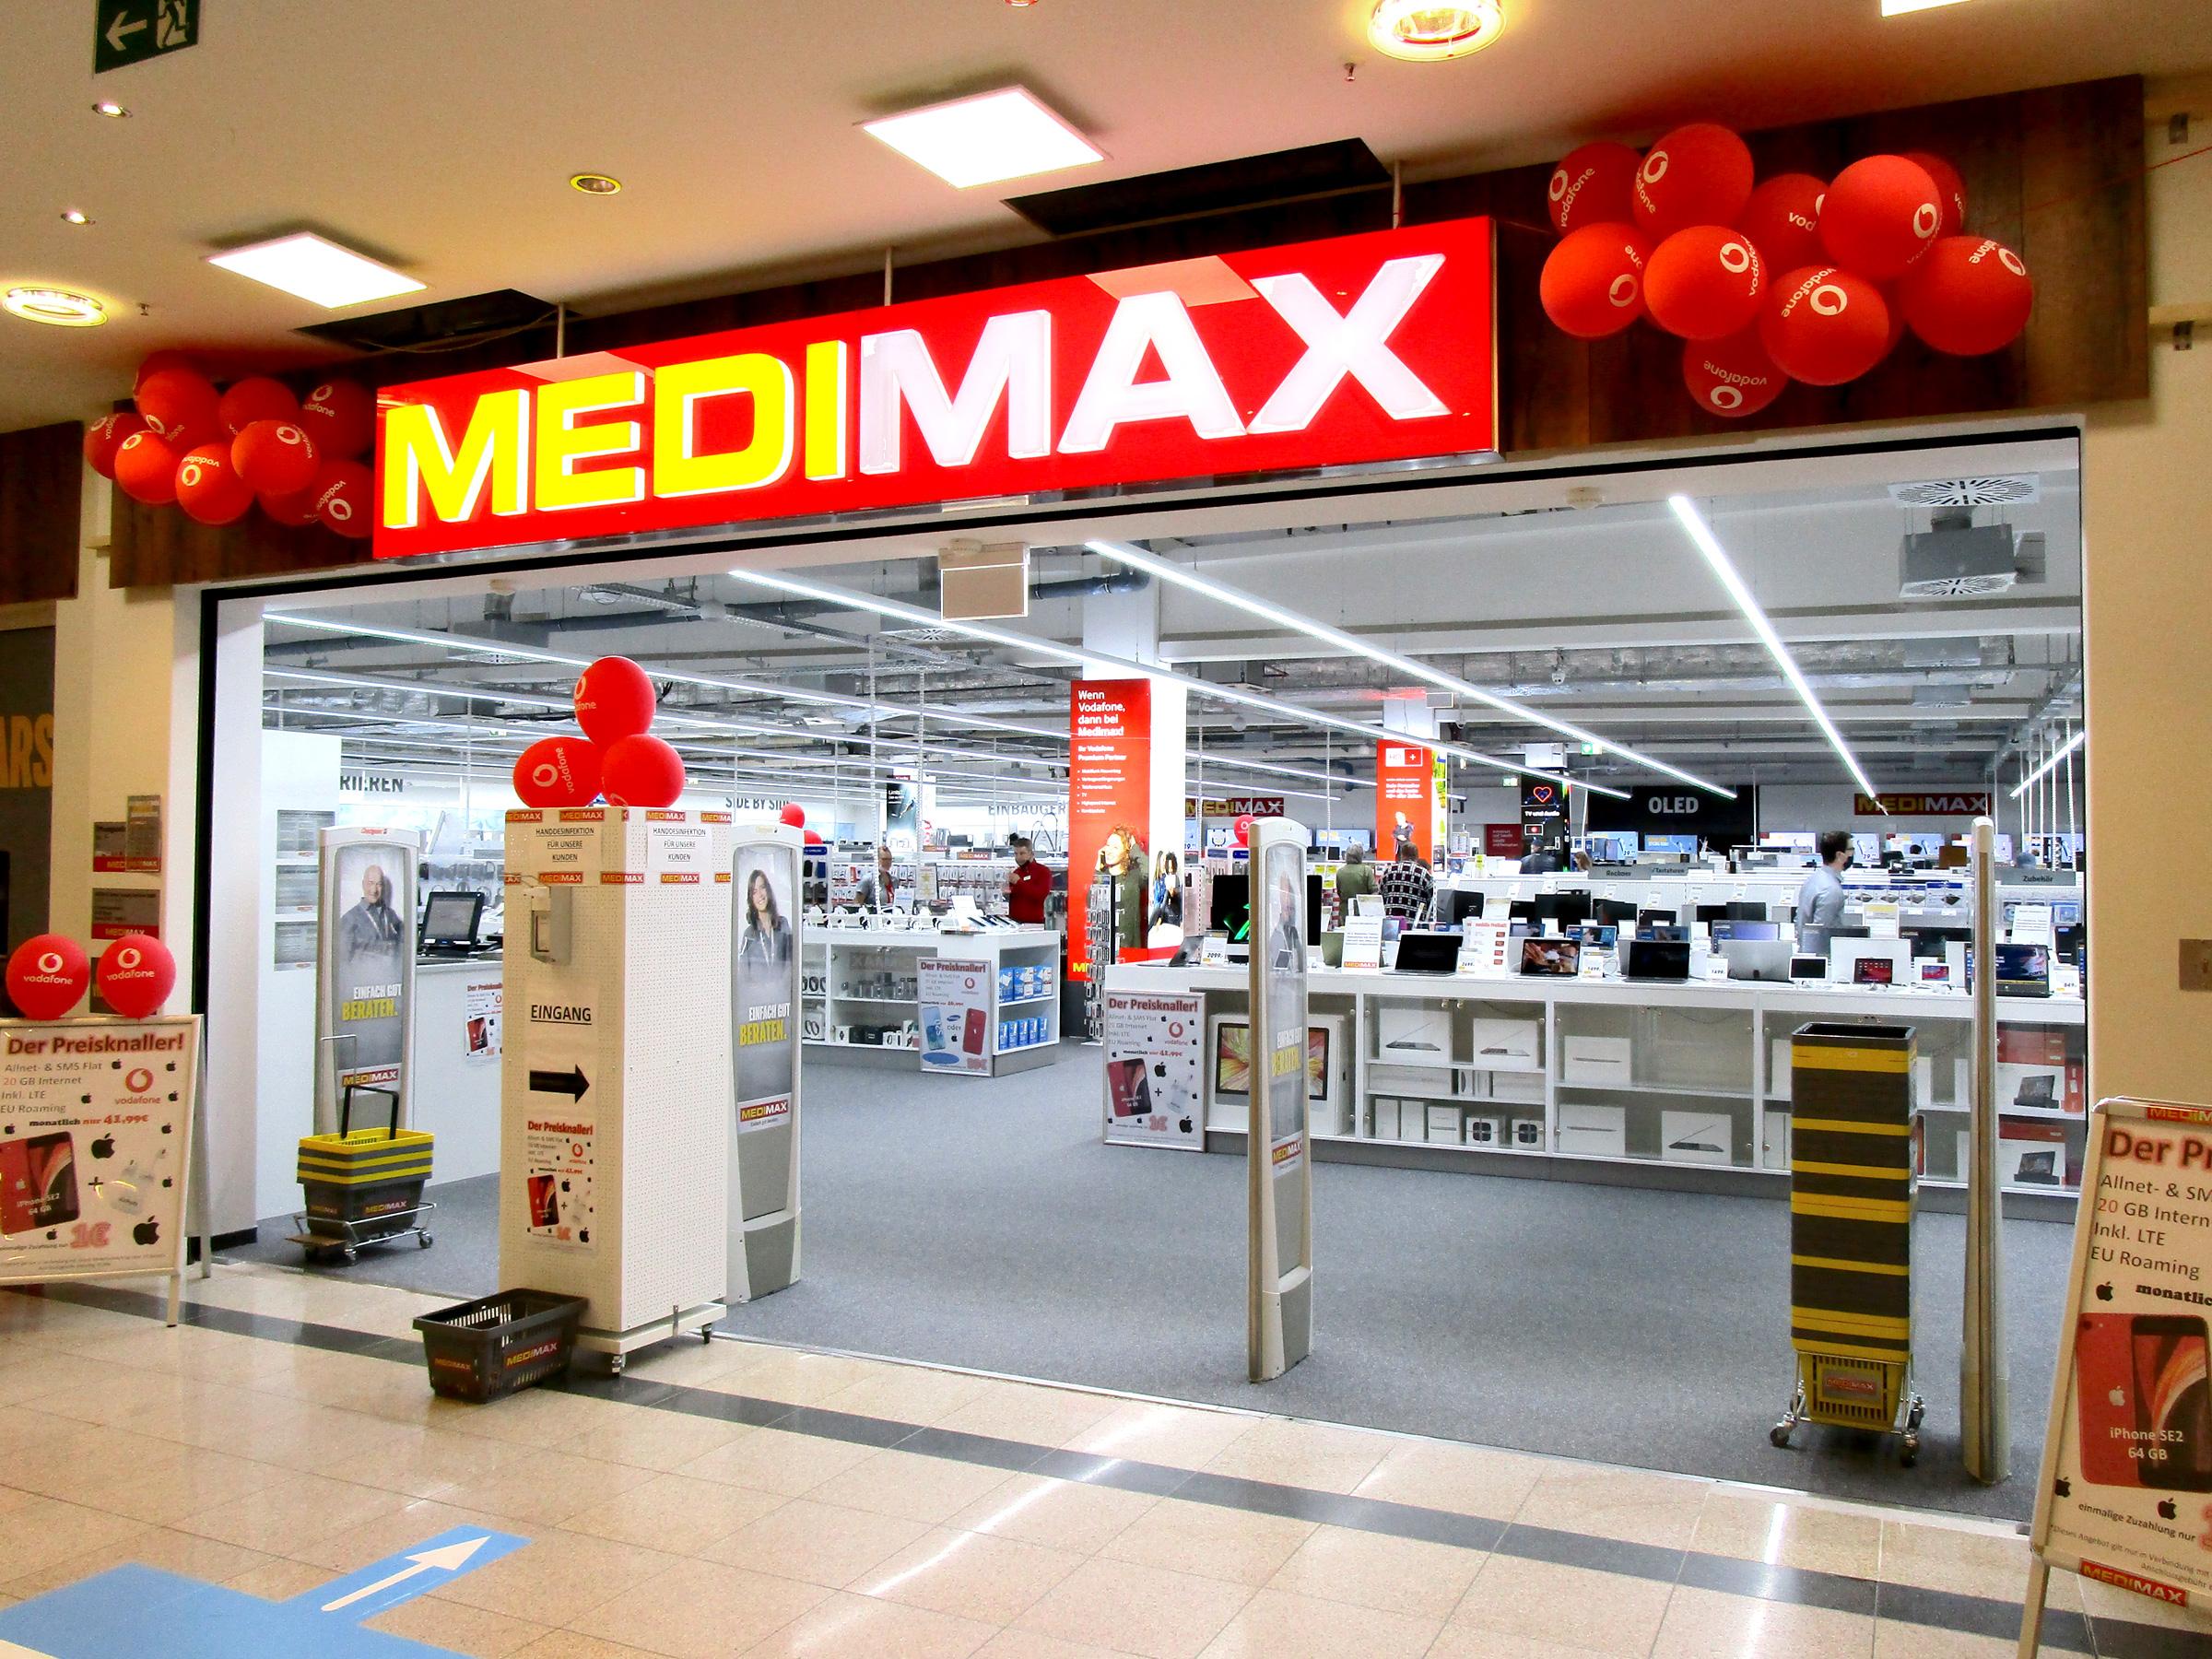 Medimax_3284_202005